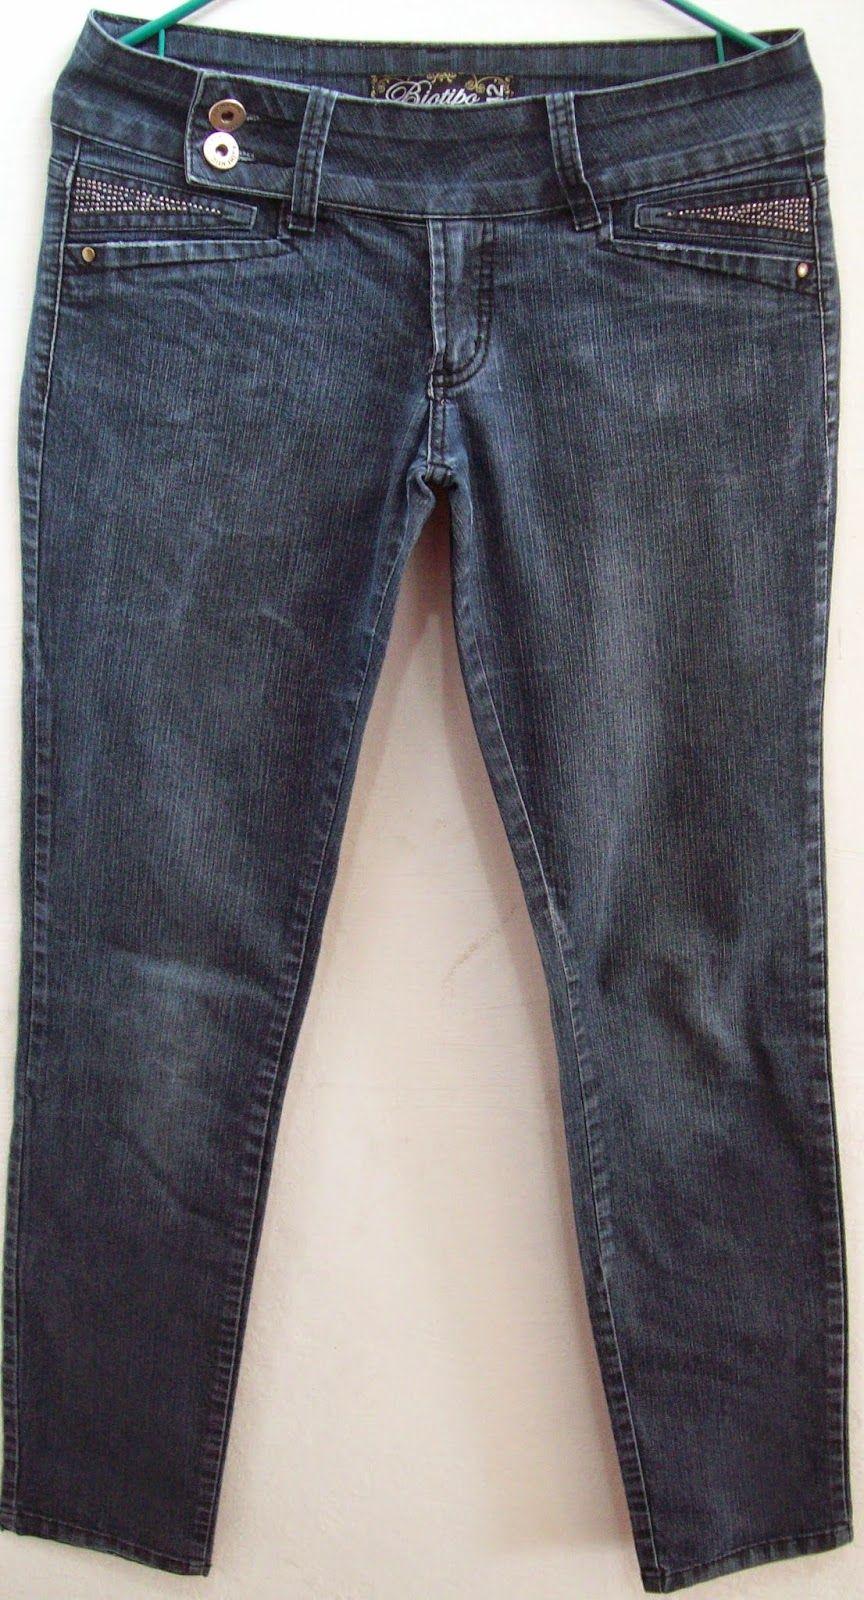 Calça jeans Biotipo tamanho 42